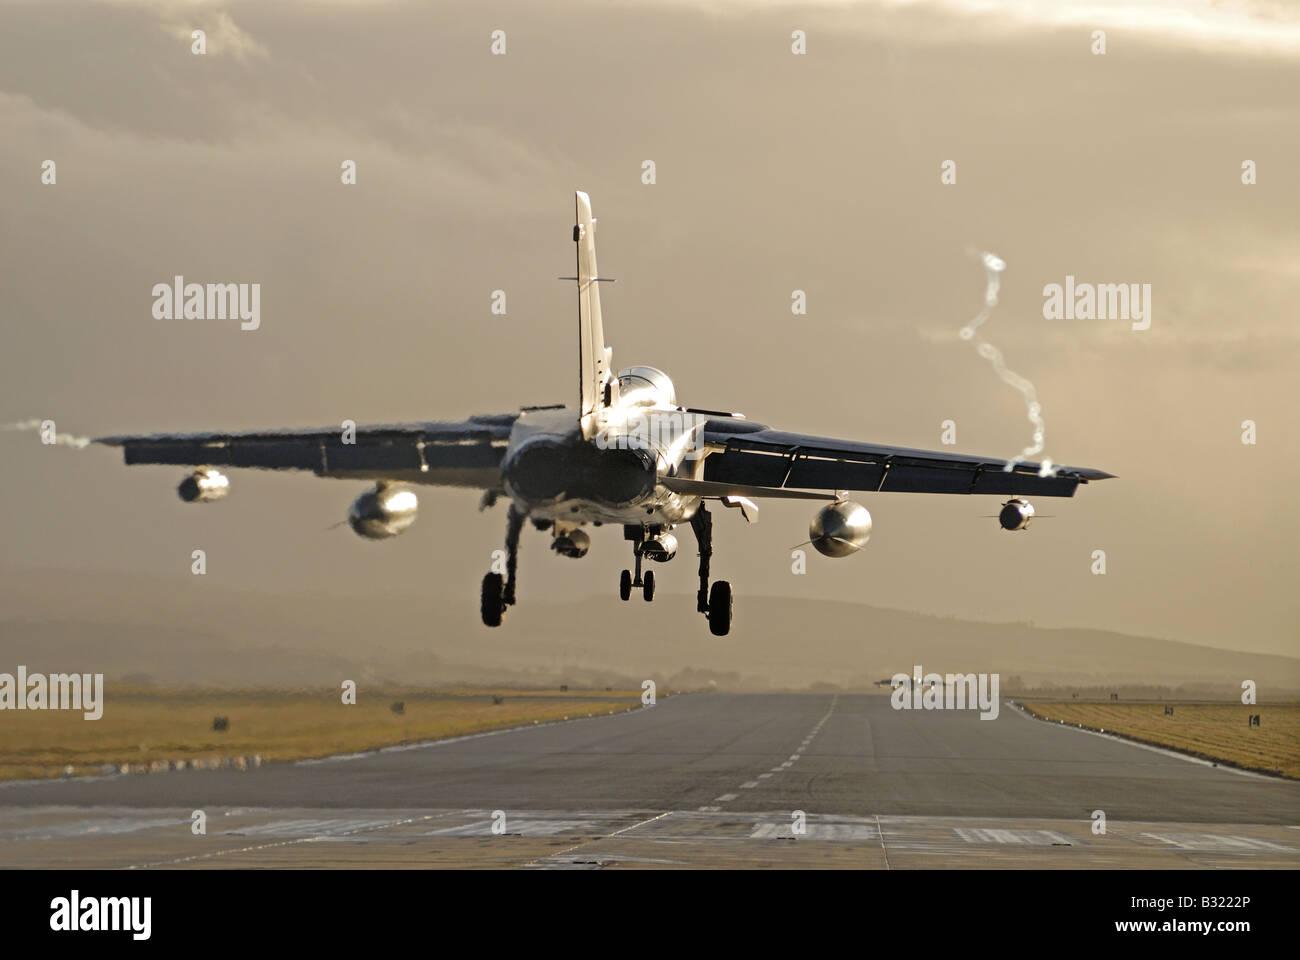 F4 Panavia Tornado on Runway Approach at RAF Lossiemouth Moray Scotland - Stock Image